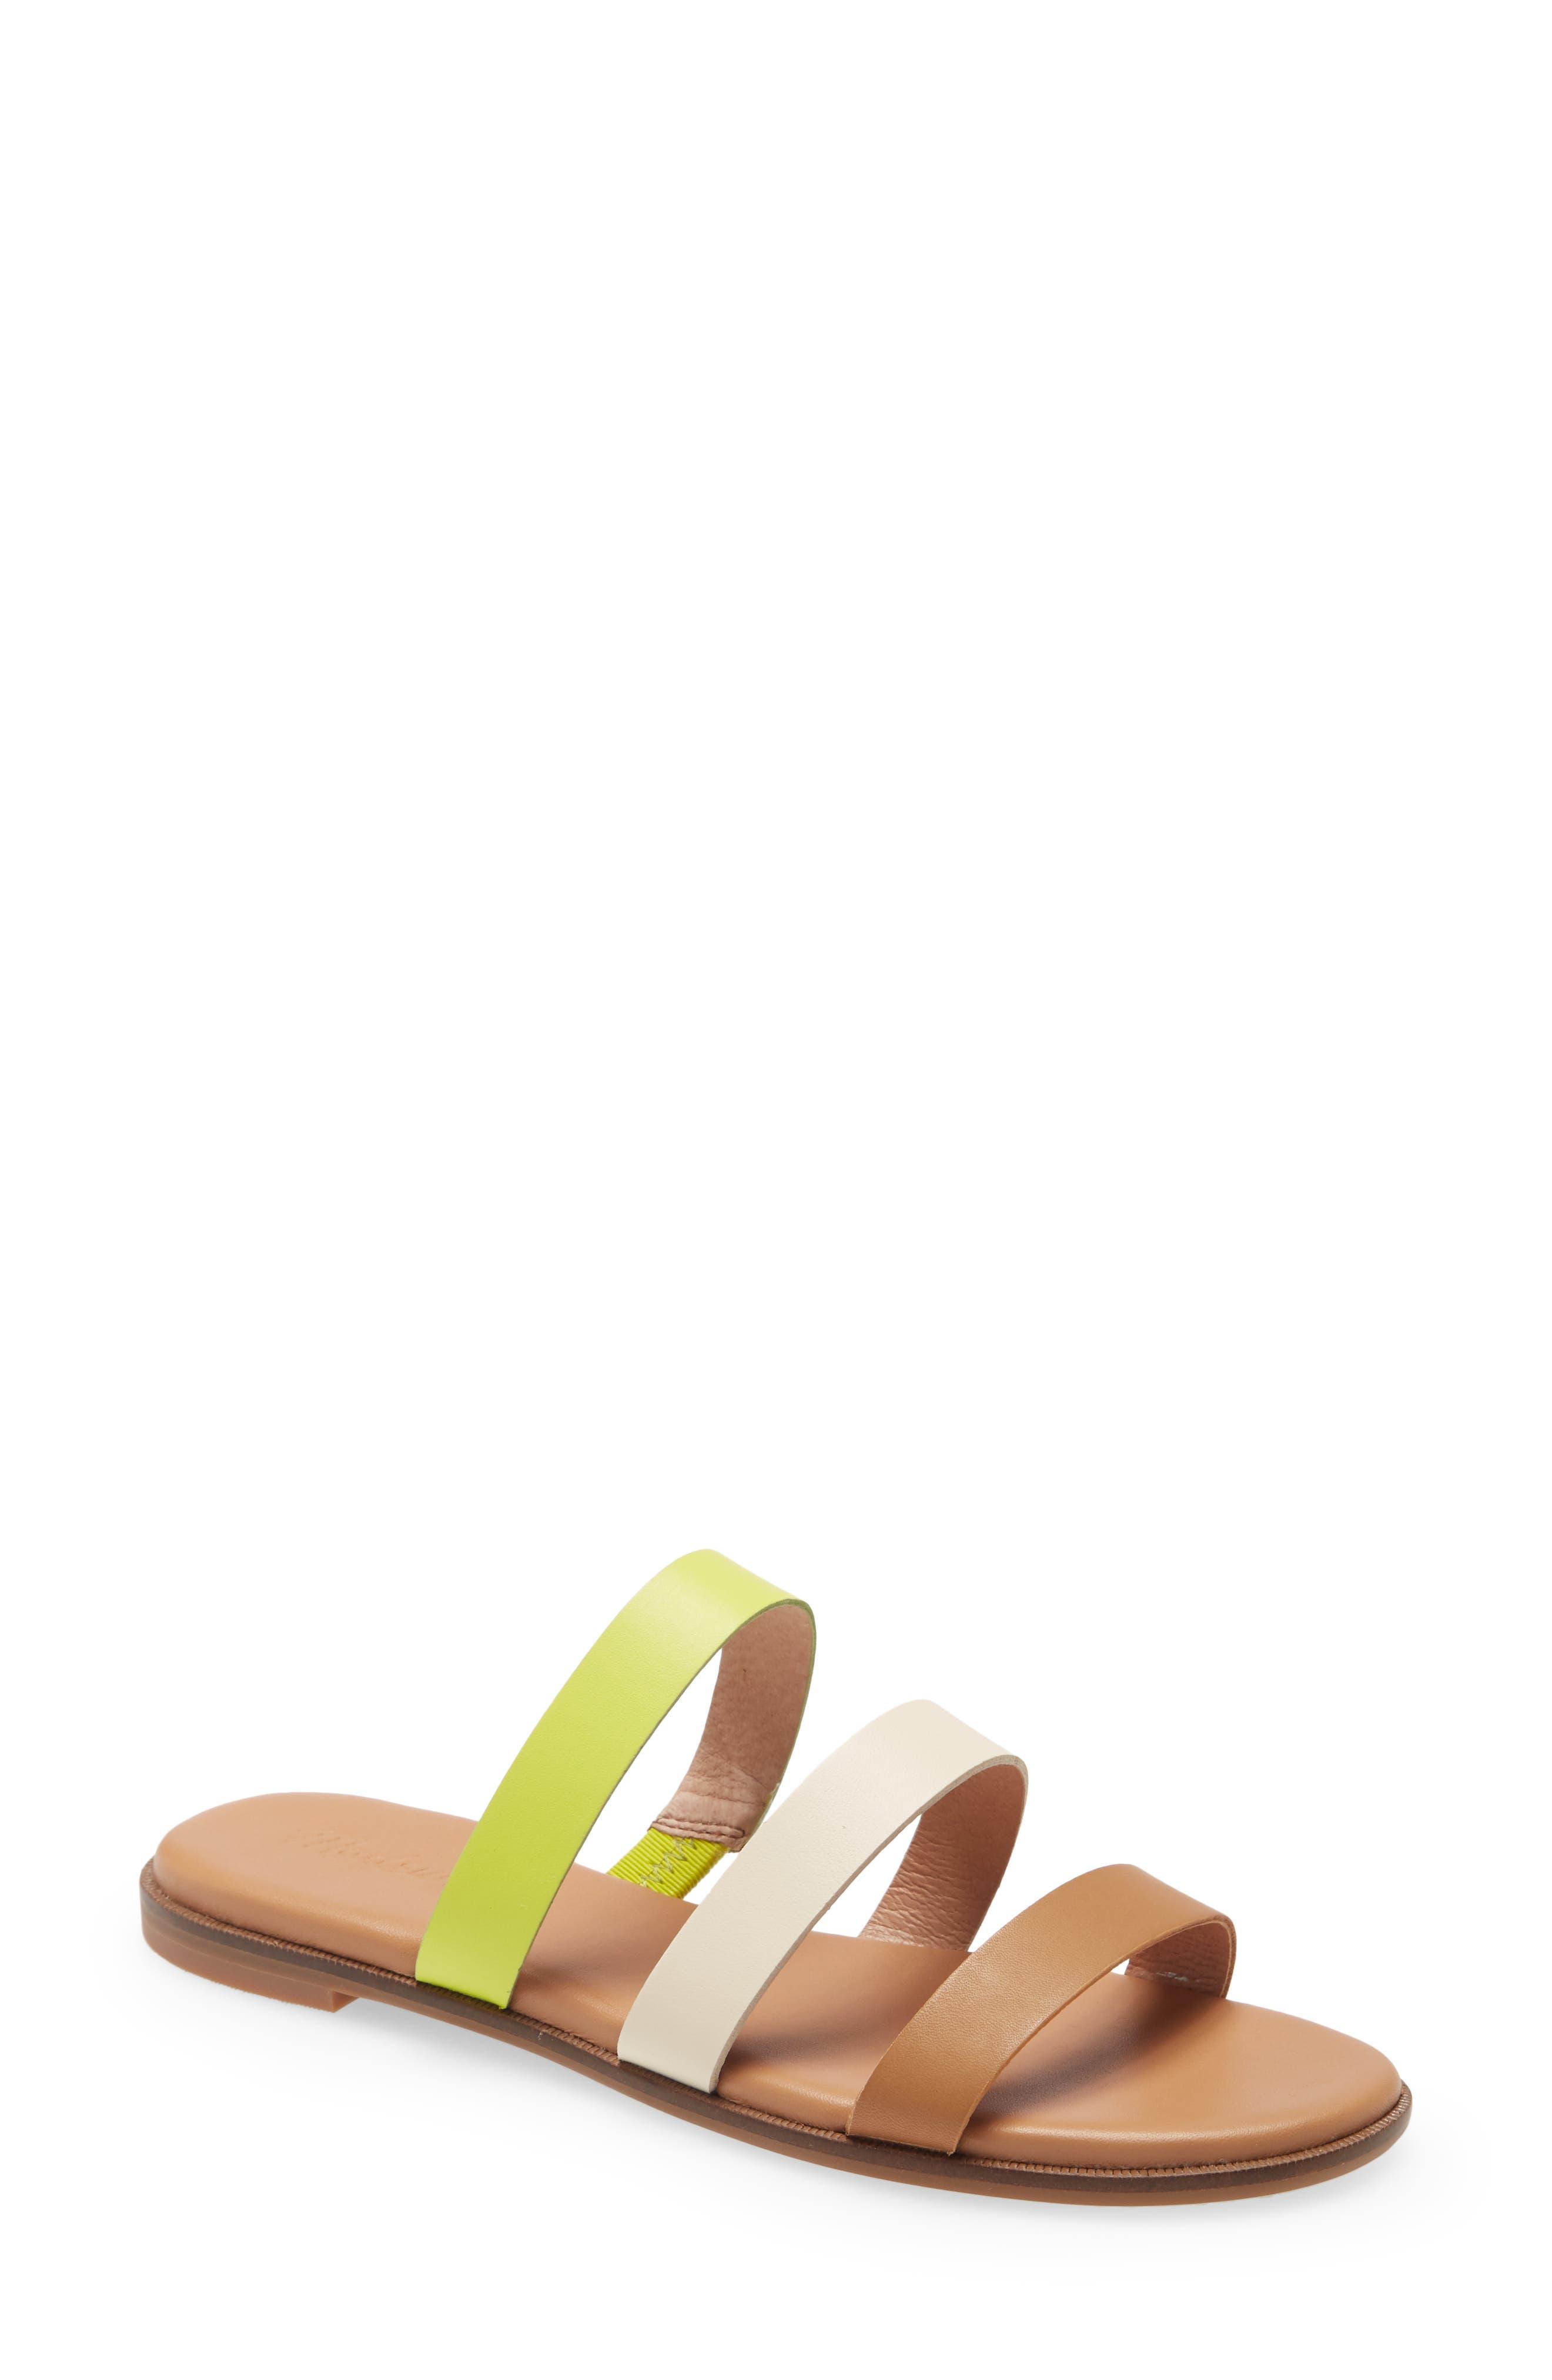 The Ilana Colorblock Slide Sandal